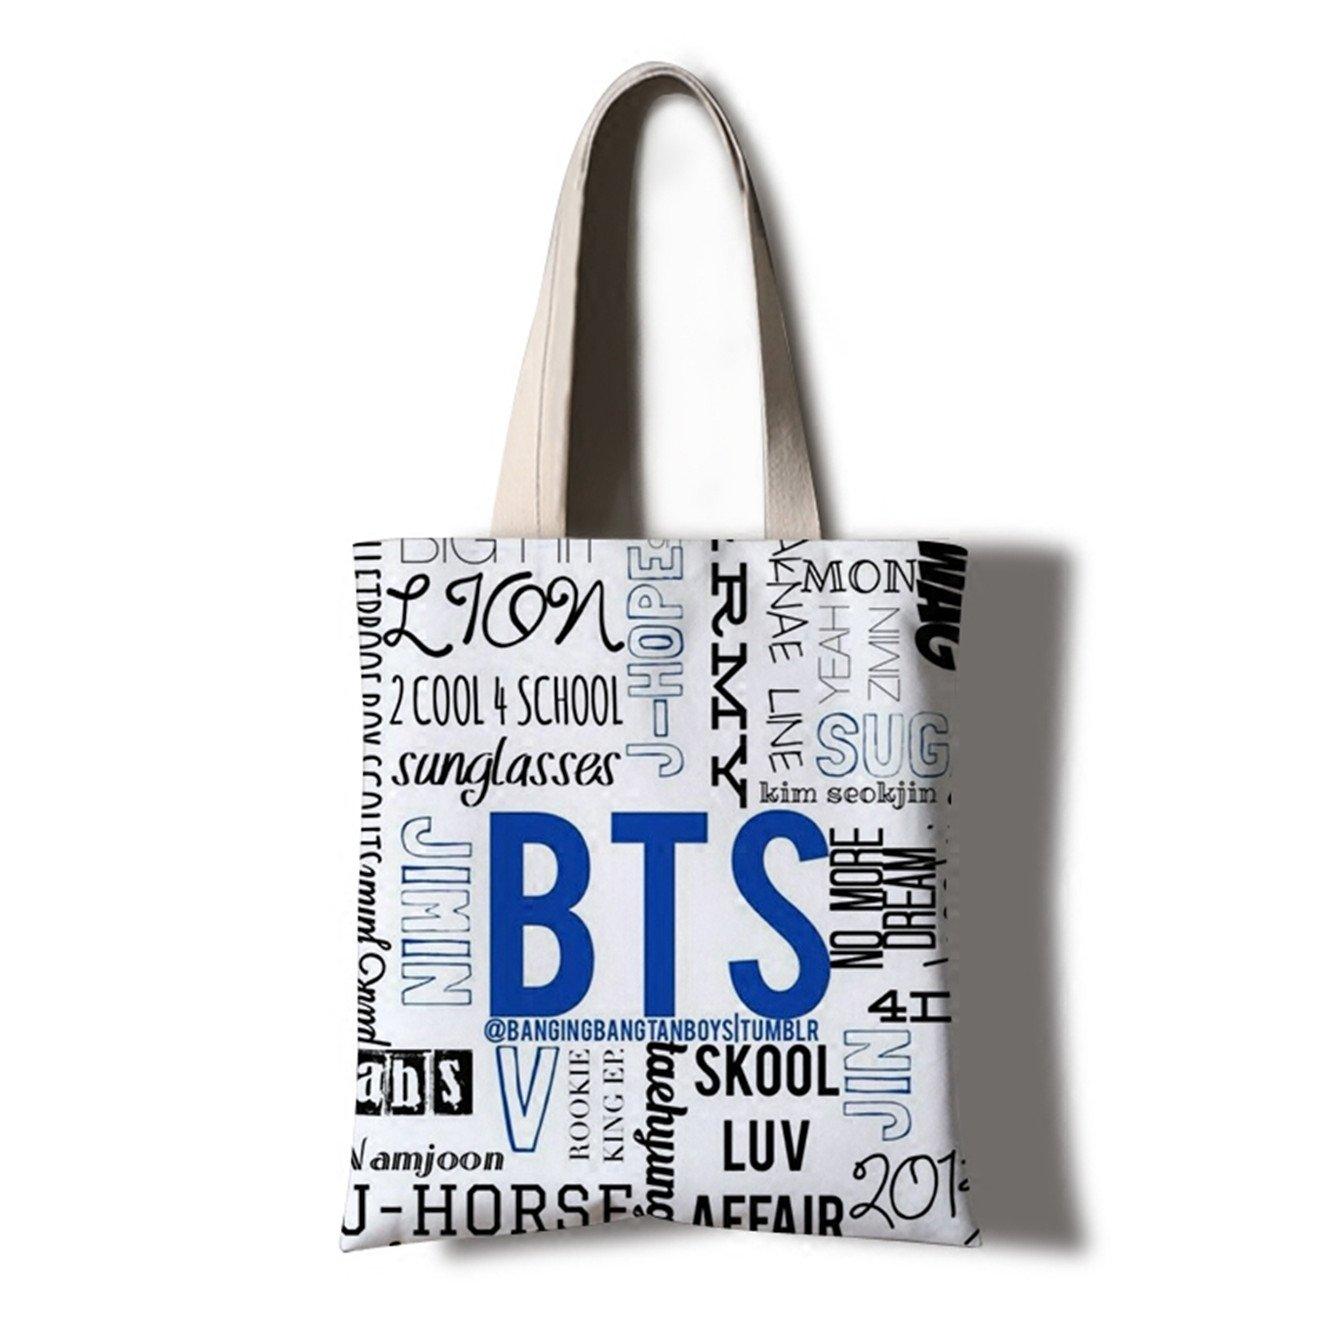 JUSTGOGO KPOP BTS Bangtan boys Casual Messenger Bag Cross-body Bag Shoulder  Bag Travel Bag Handbag Tote Bag (2)